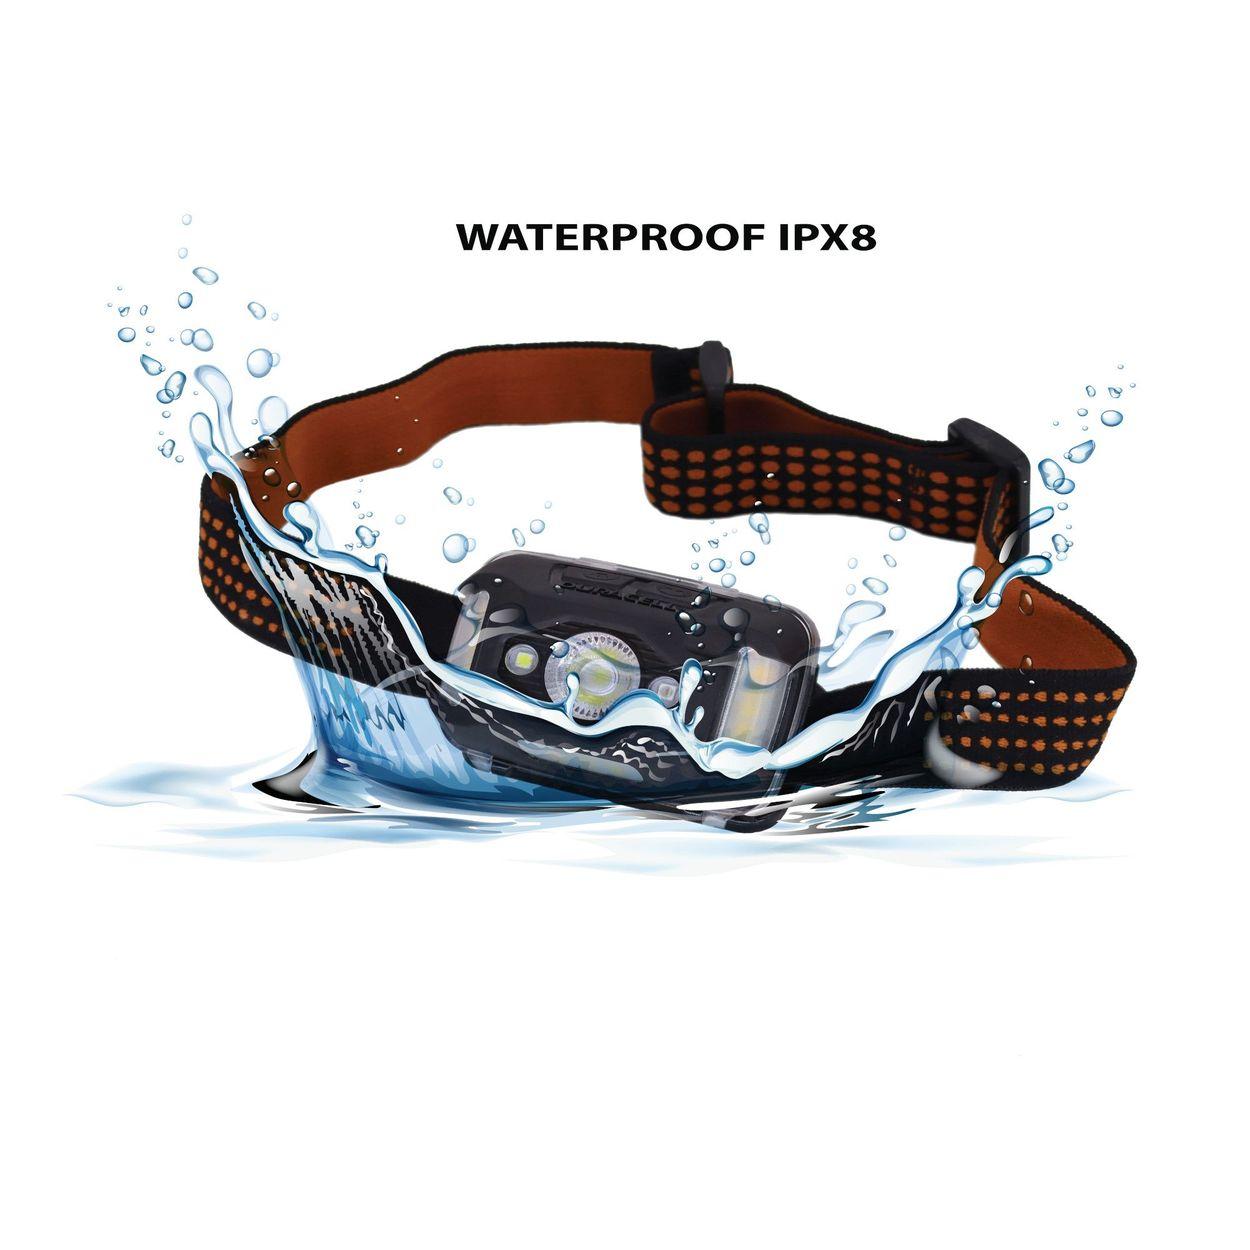 Waterproof – IPX8